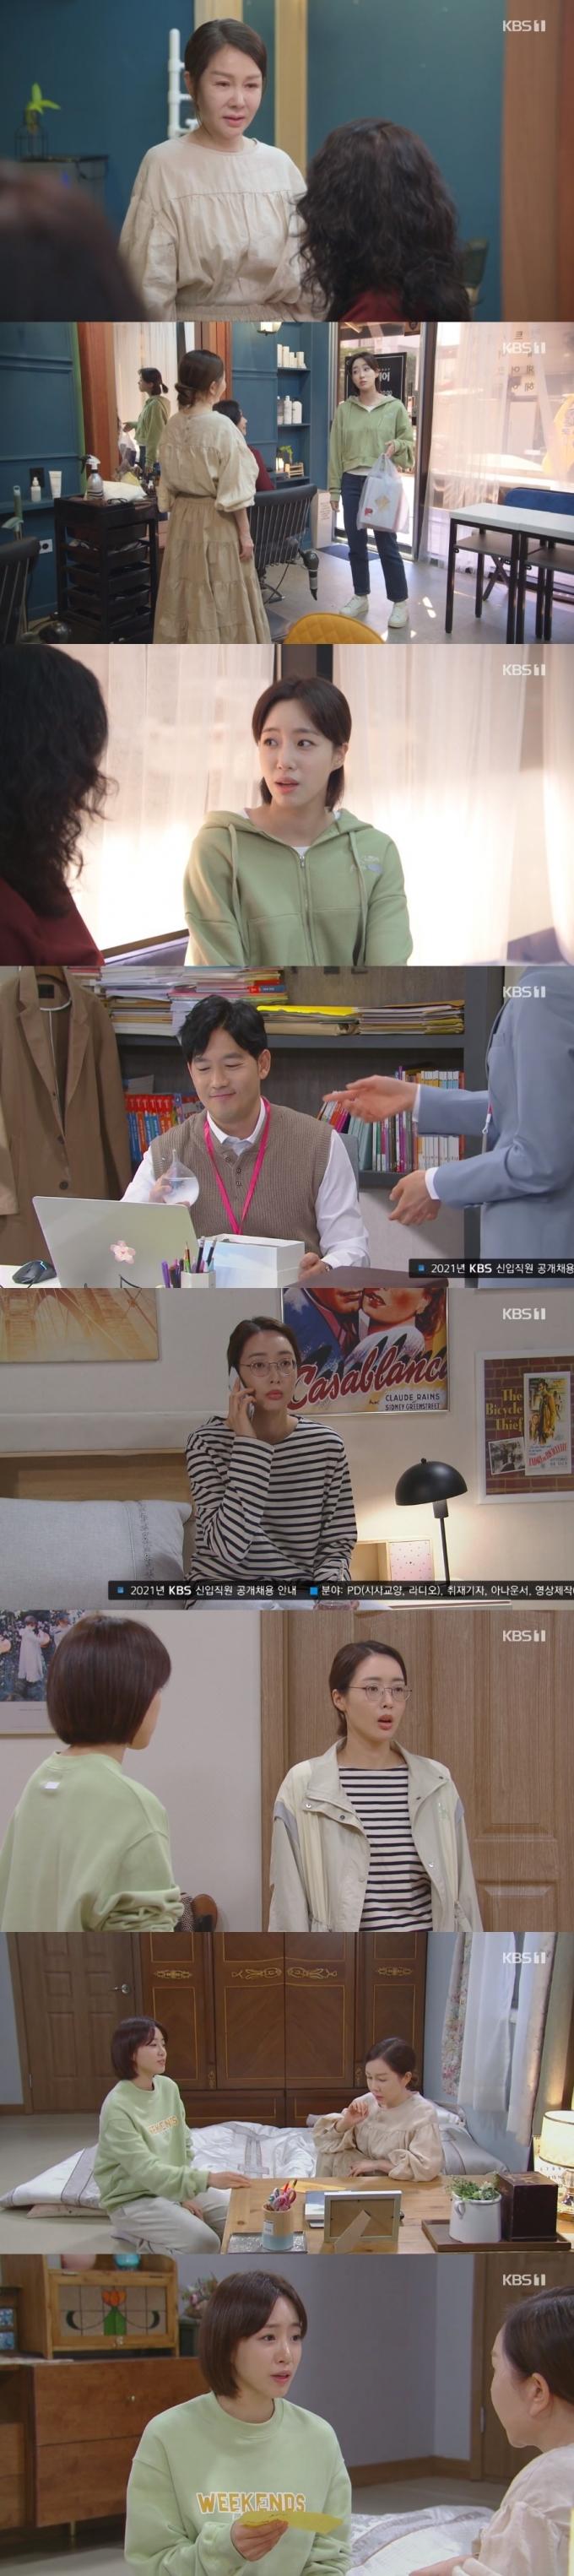 KBS 1TV '속아도 꿈결' 캡처 © 뉴스1